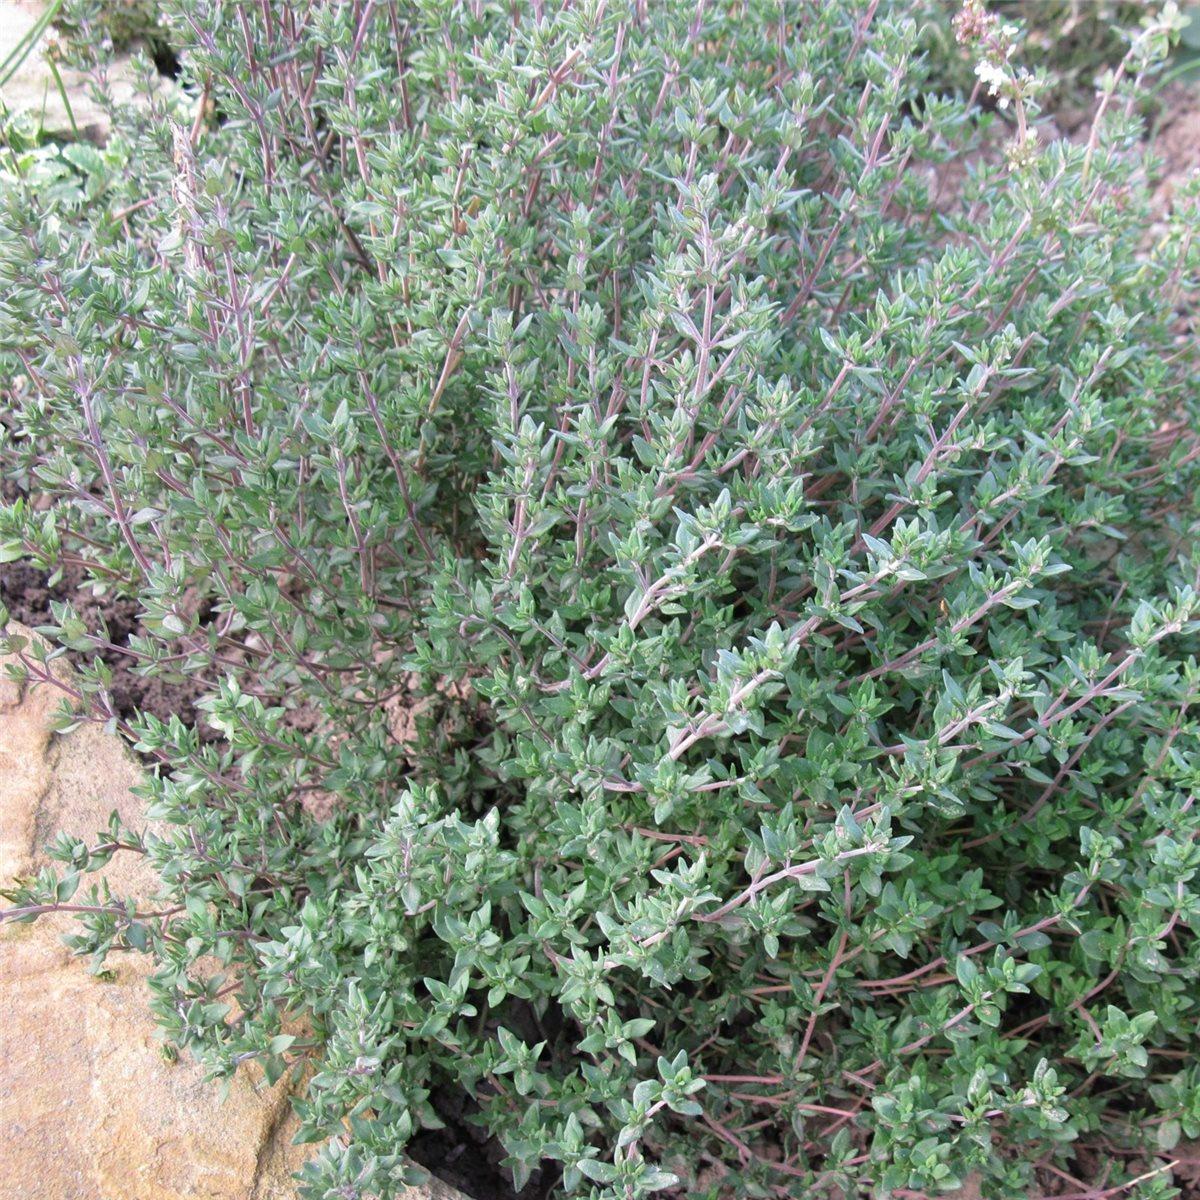 Gewürzthymian Thymus vulgaris PRECOMPA graugrüne Belaubung Heilkraut Gewürz